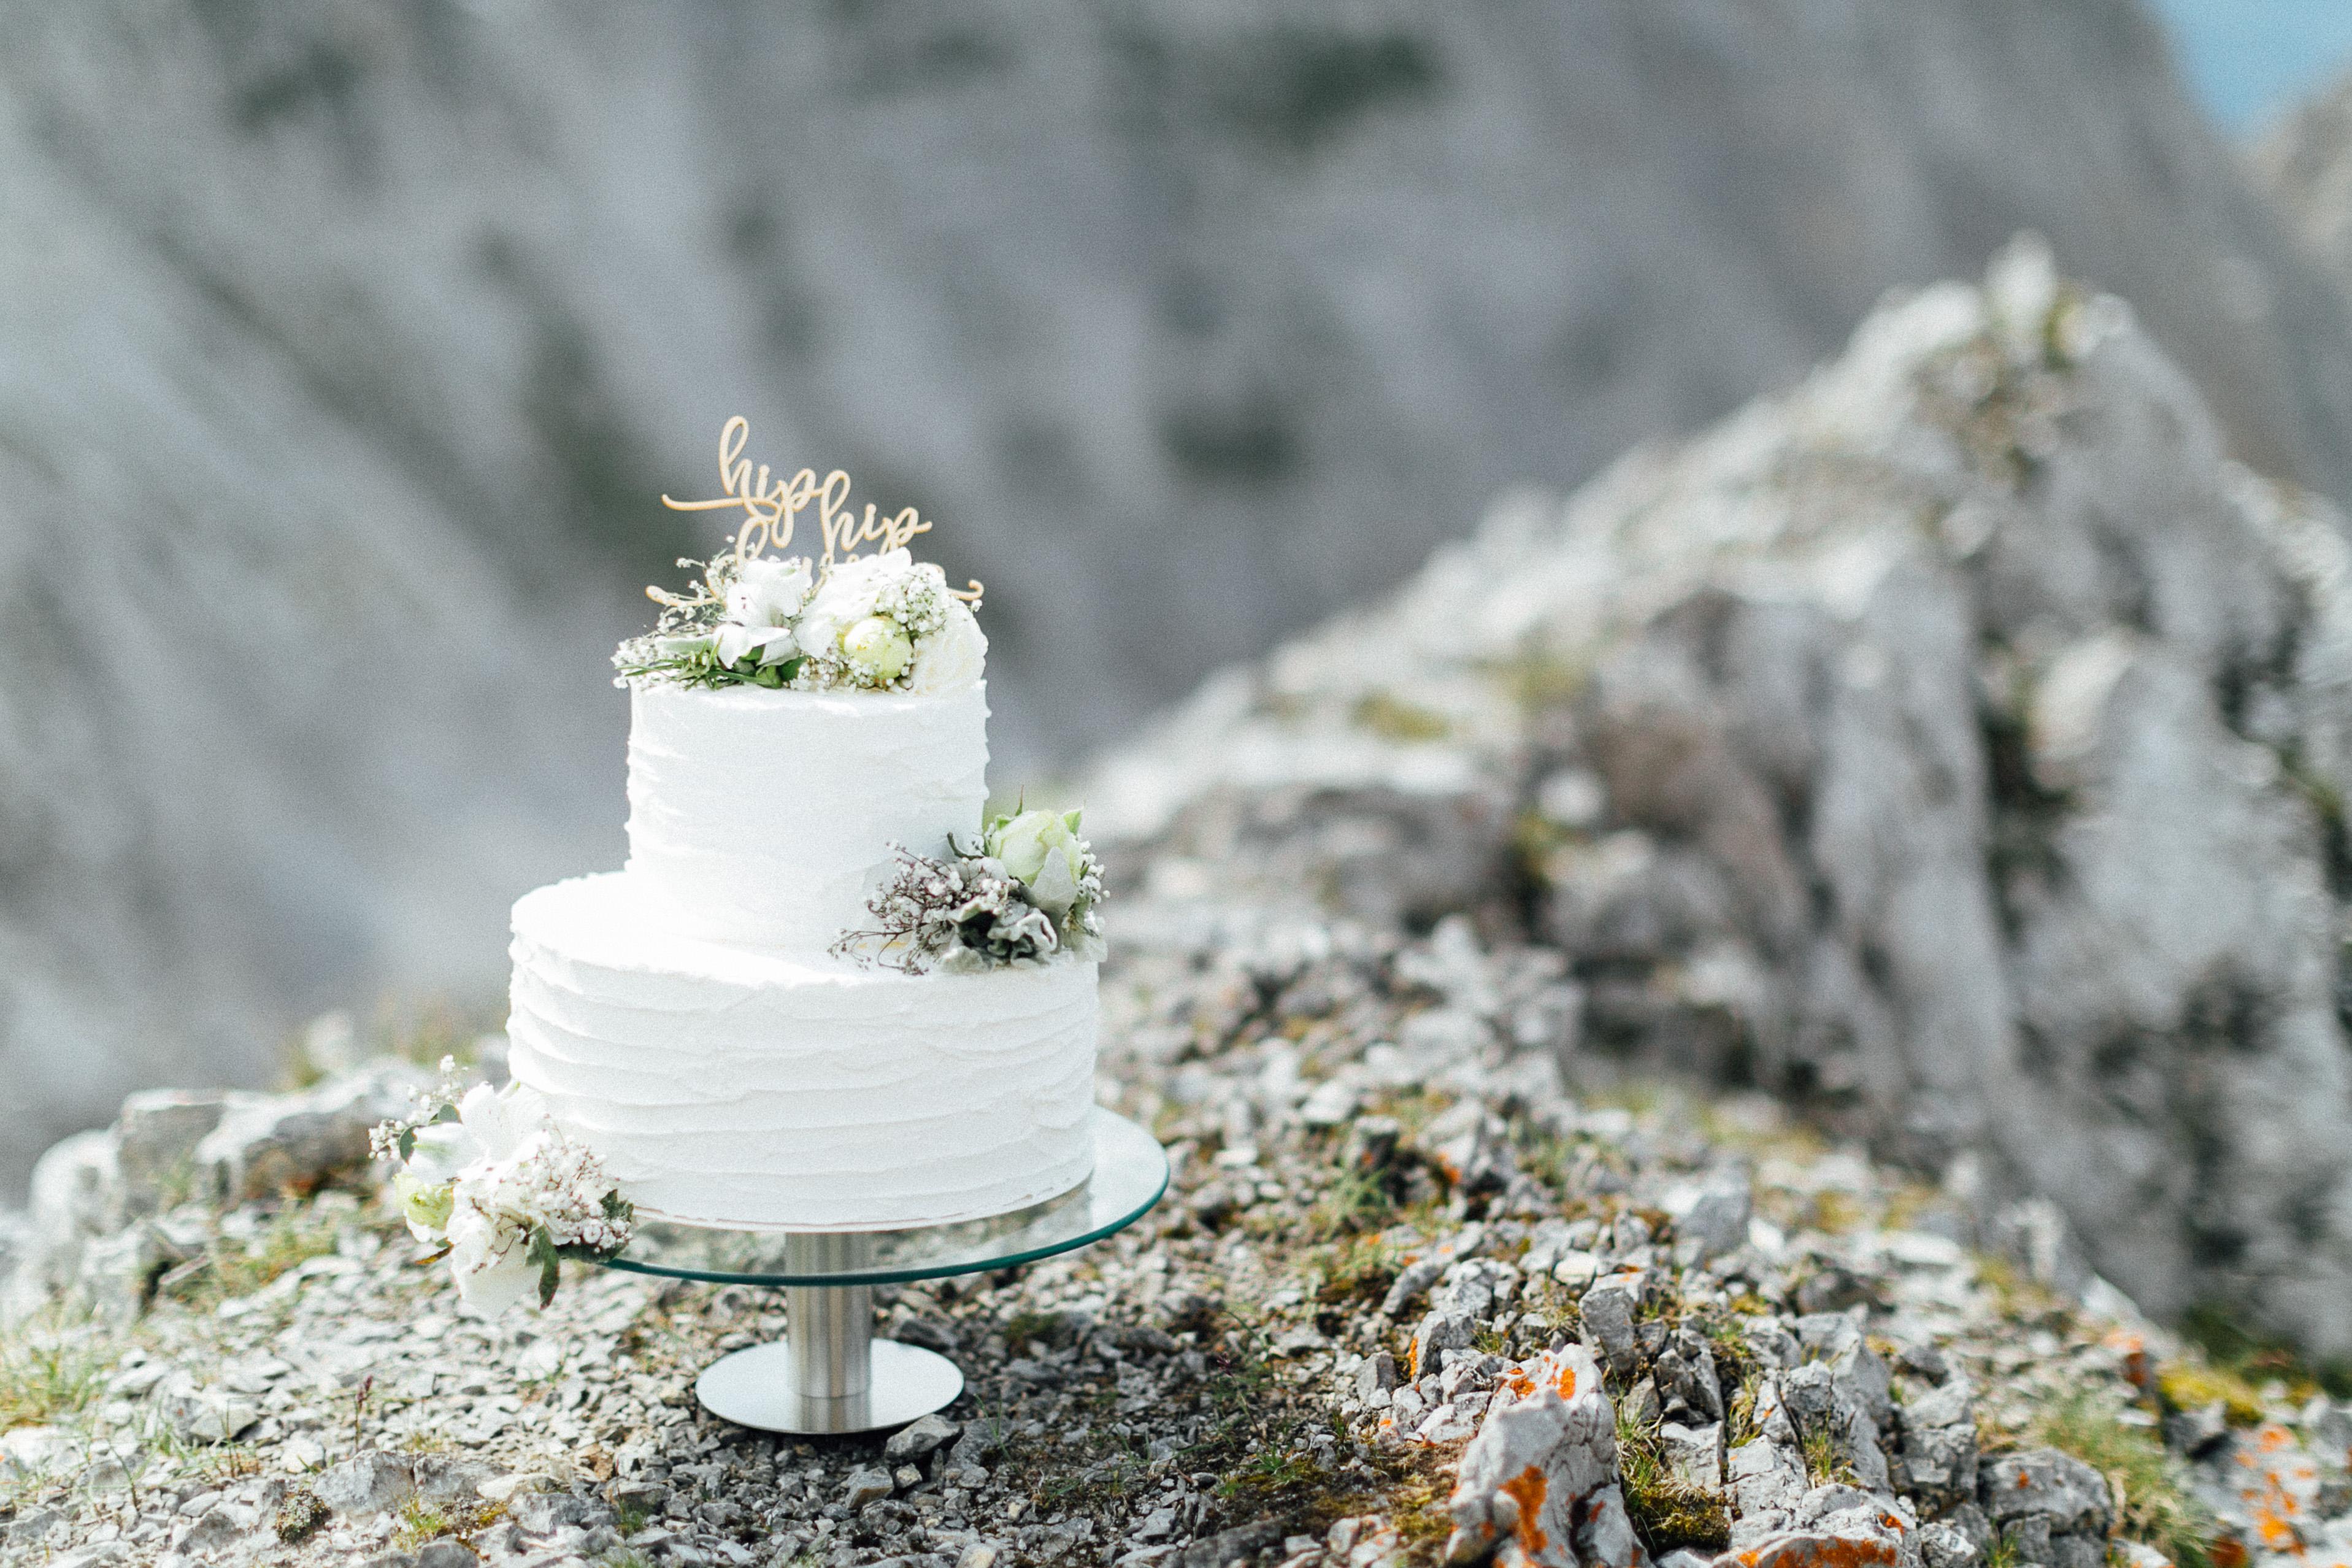 Wedding cake, Cremetorte